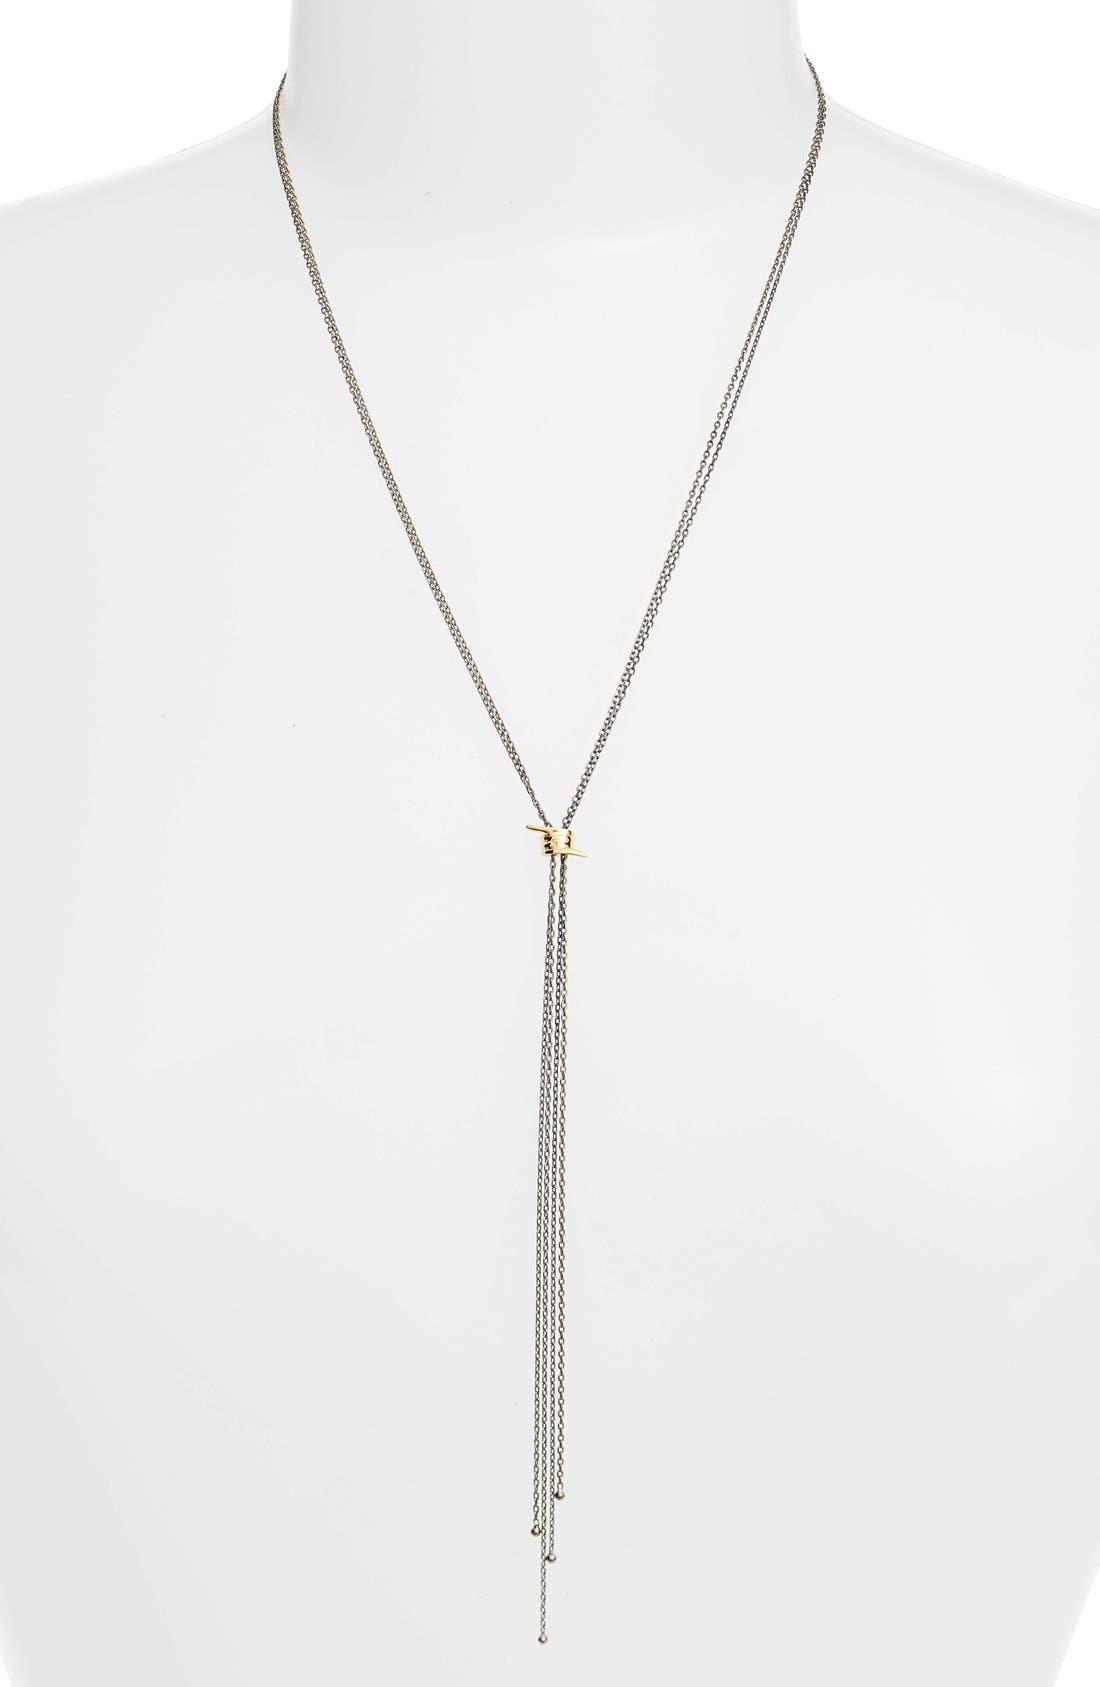 Jules Smith Topanga Lariat Necklace